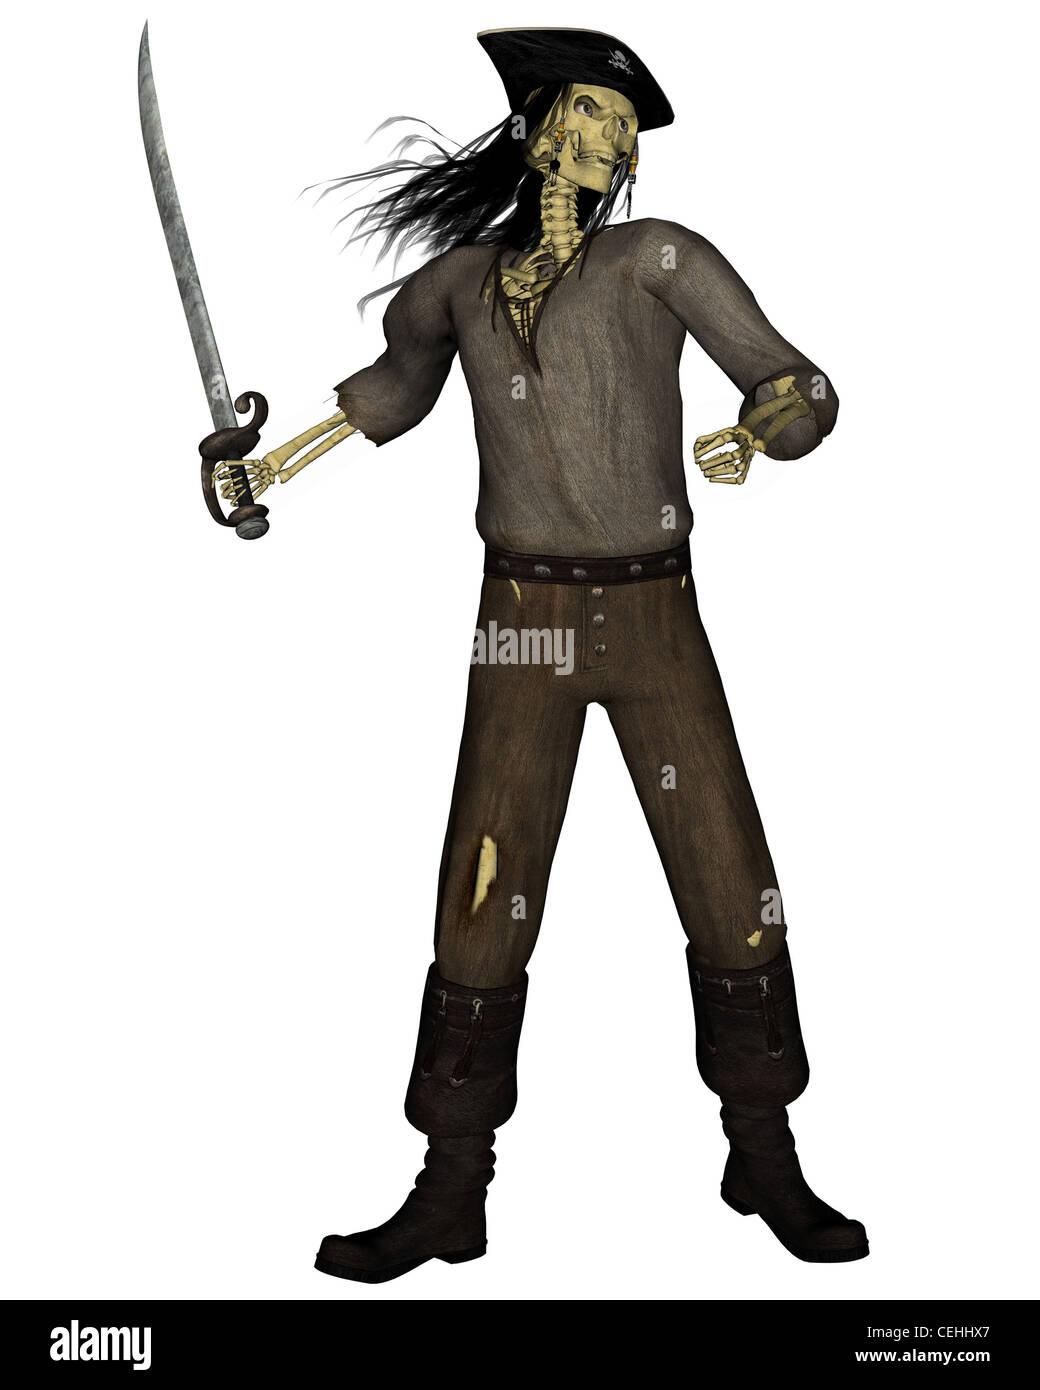 Undead Pirate Skeleton - 1 - Stock Image